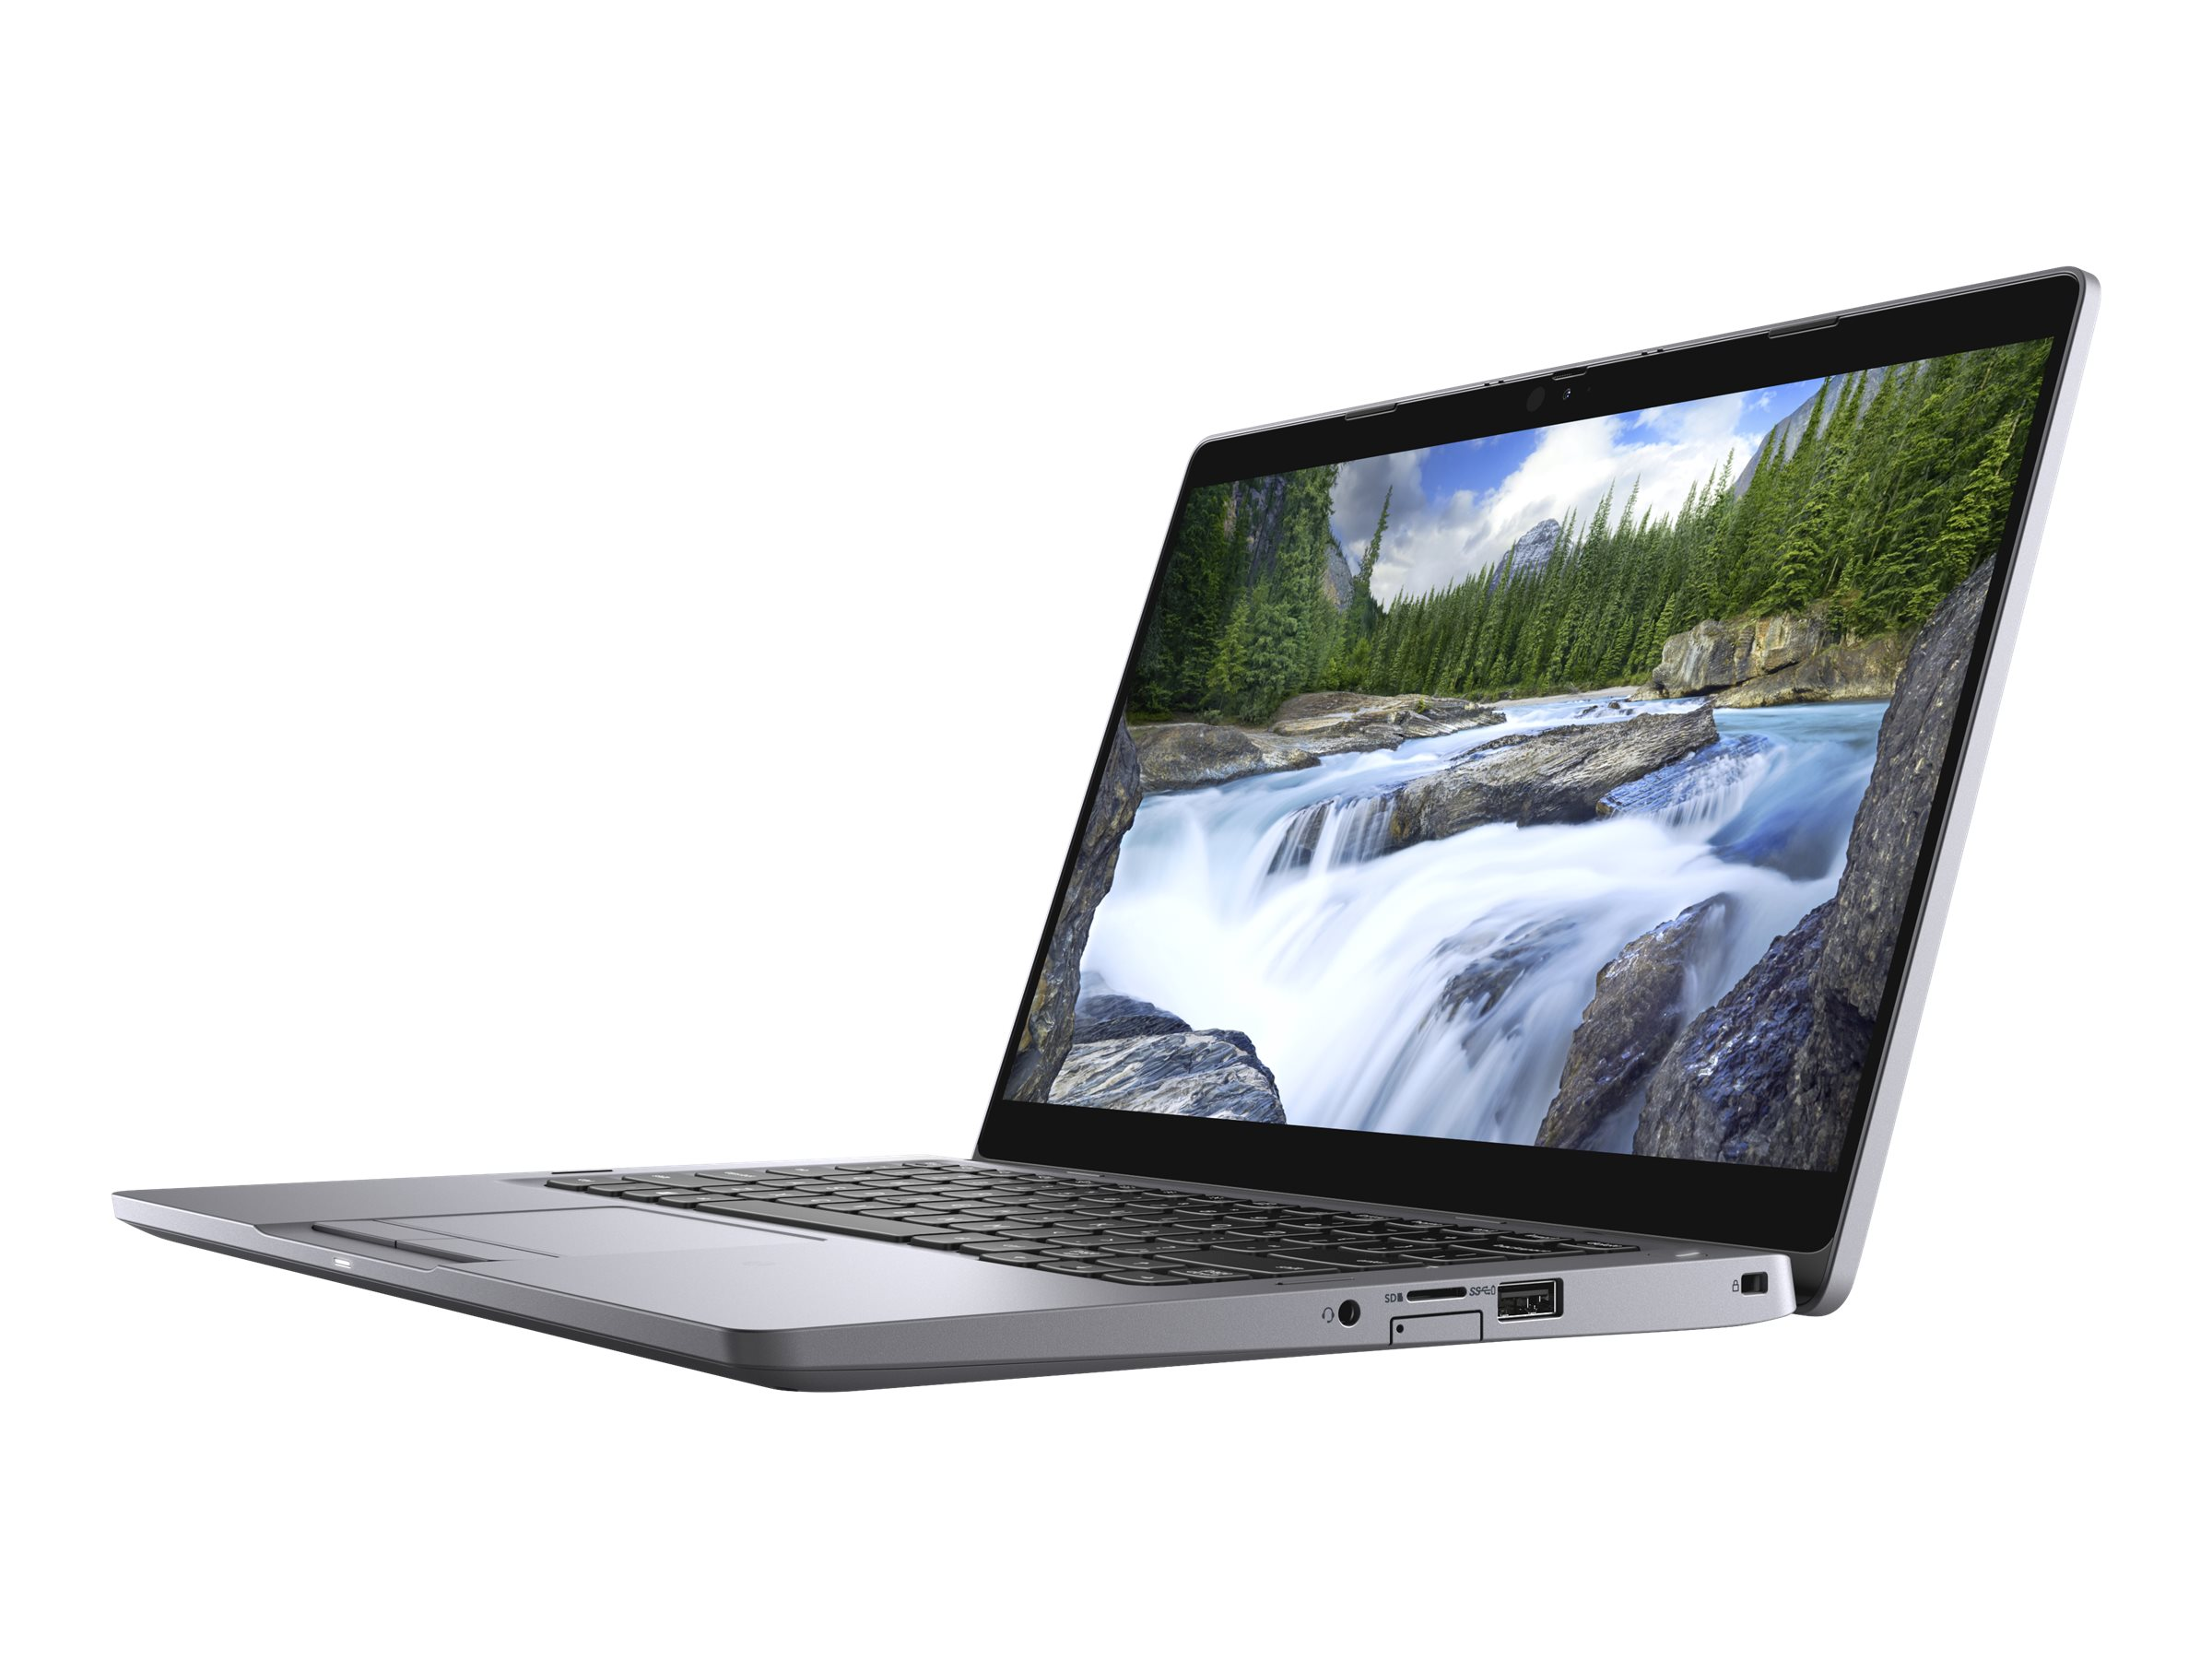 "Dell Latitude 5310 - Core i5 10310U / 1.7 GHz - vPro - Win 10 Pro 64-Bit - 16 GB RAM - 256 GB SSD - 33.704 cm (13.3"")"